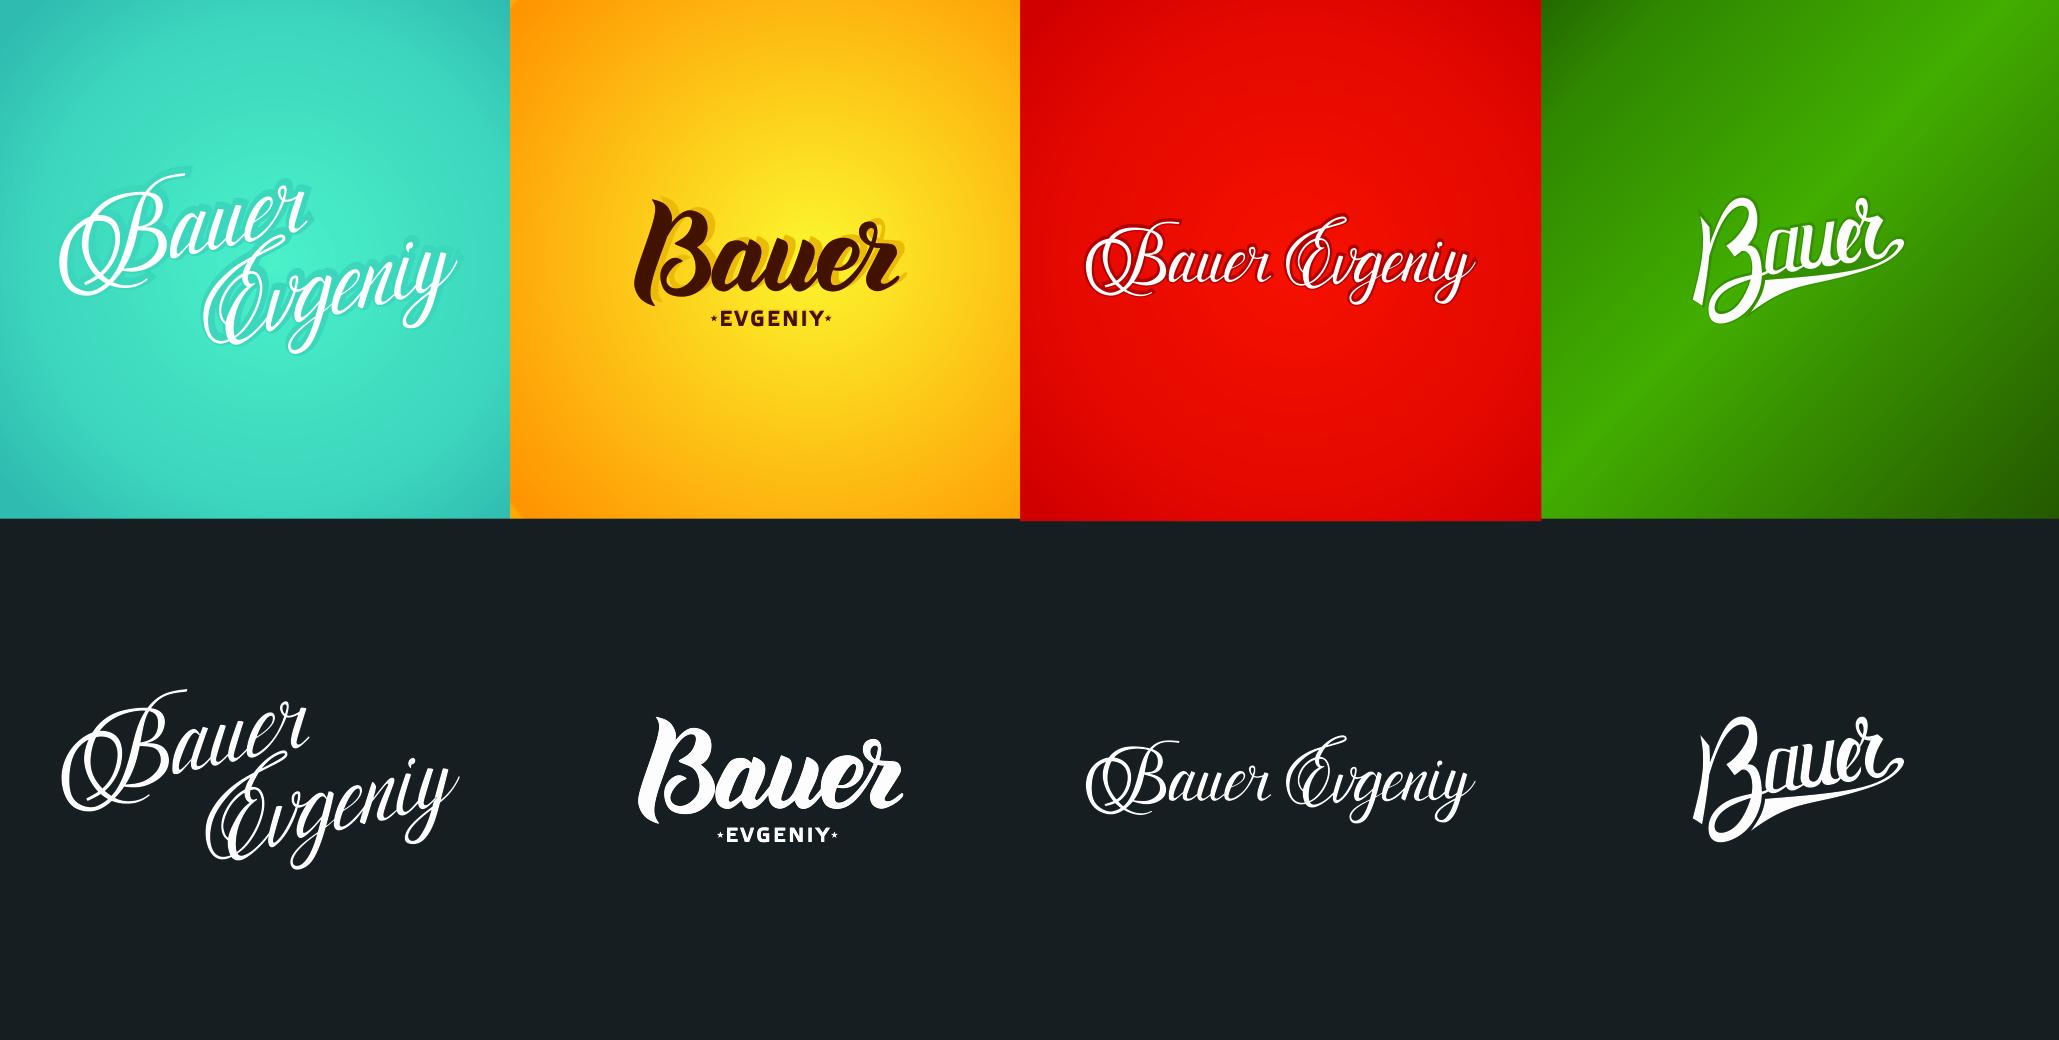 Bauer - calligraphy logo